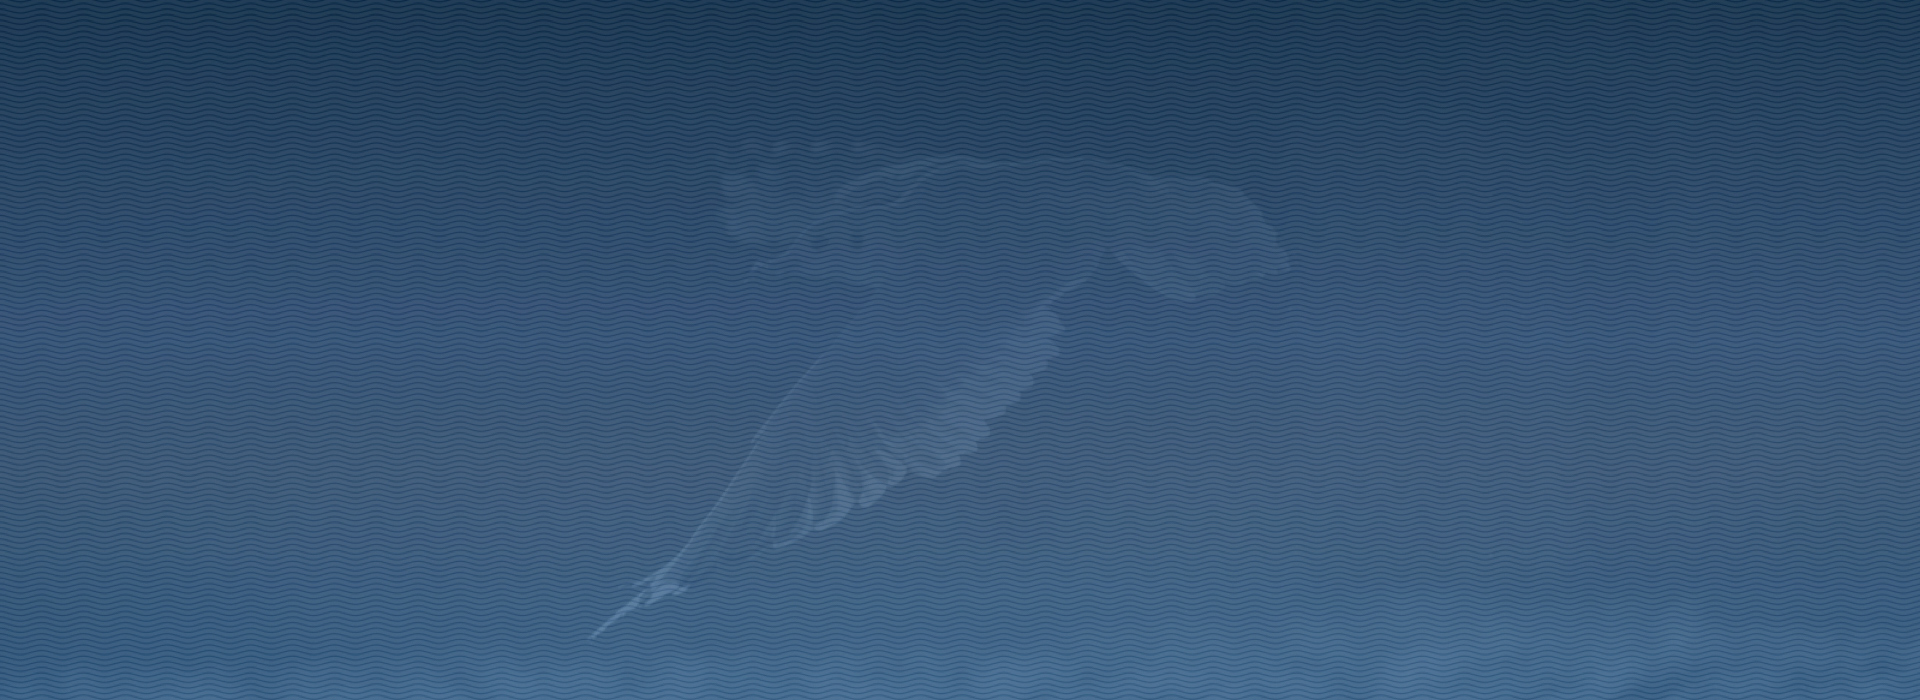 https://www.maritimesuper.com.au/sites/default/files/revslider/image/carousel-bird.jpg